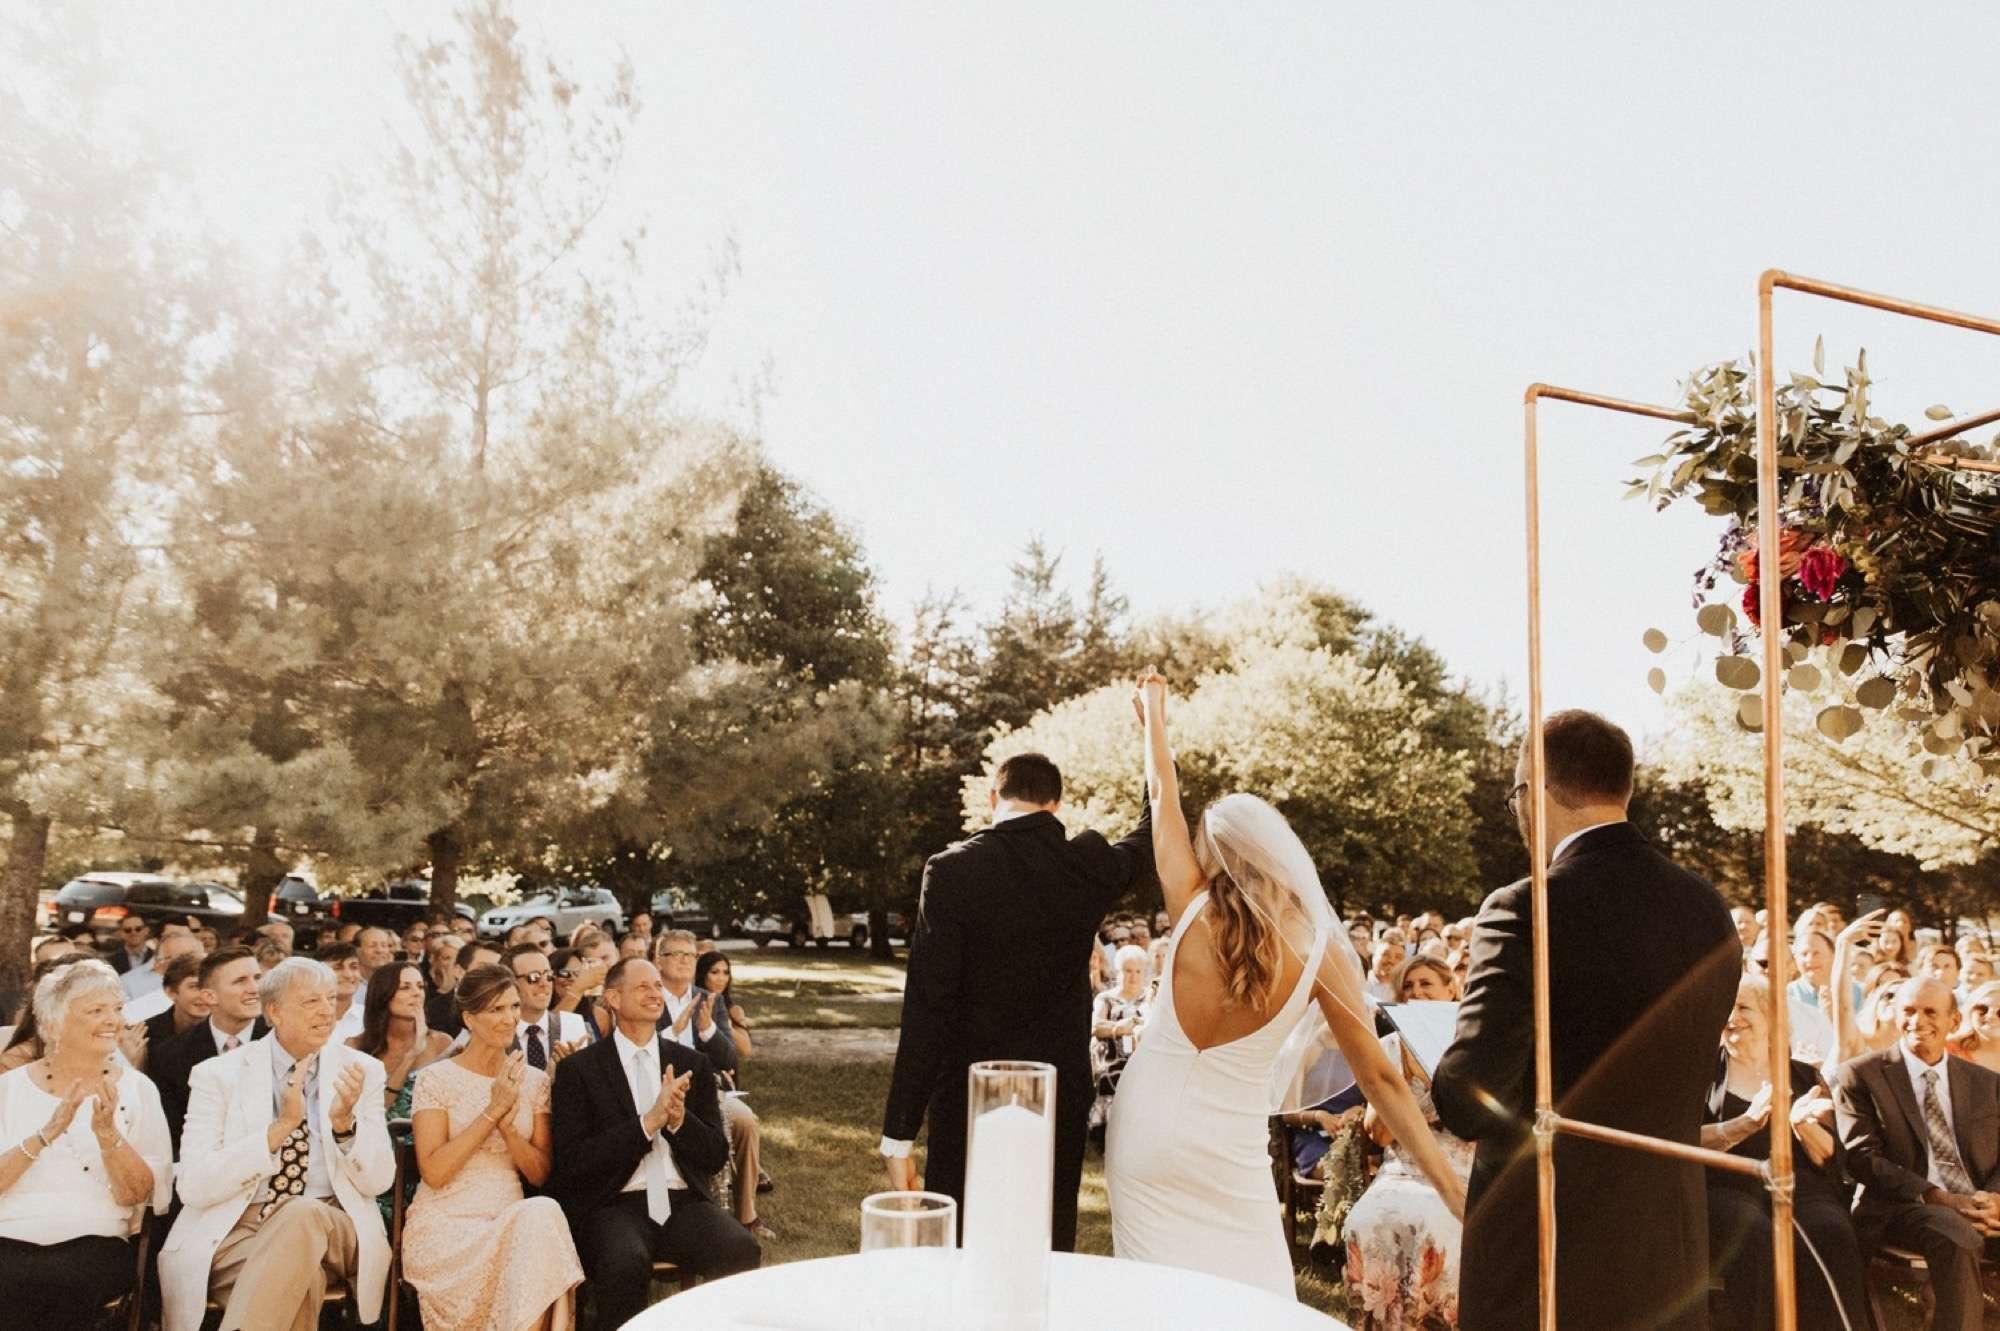 stonehaven barn wedding in Des Moines by anna jones